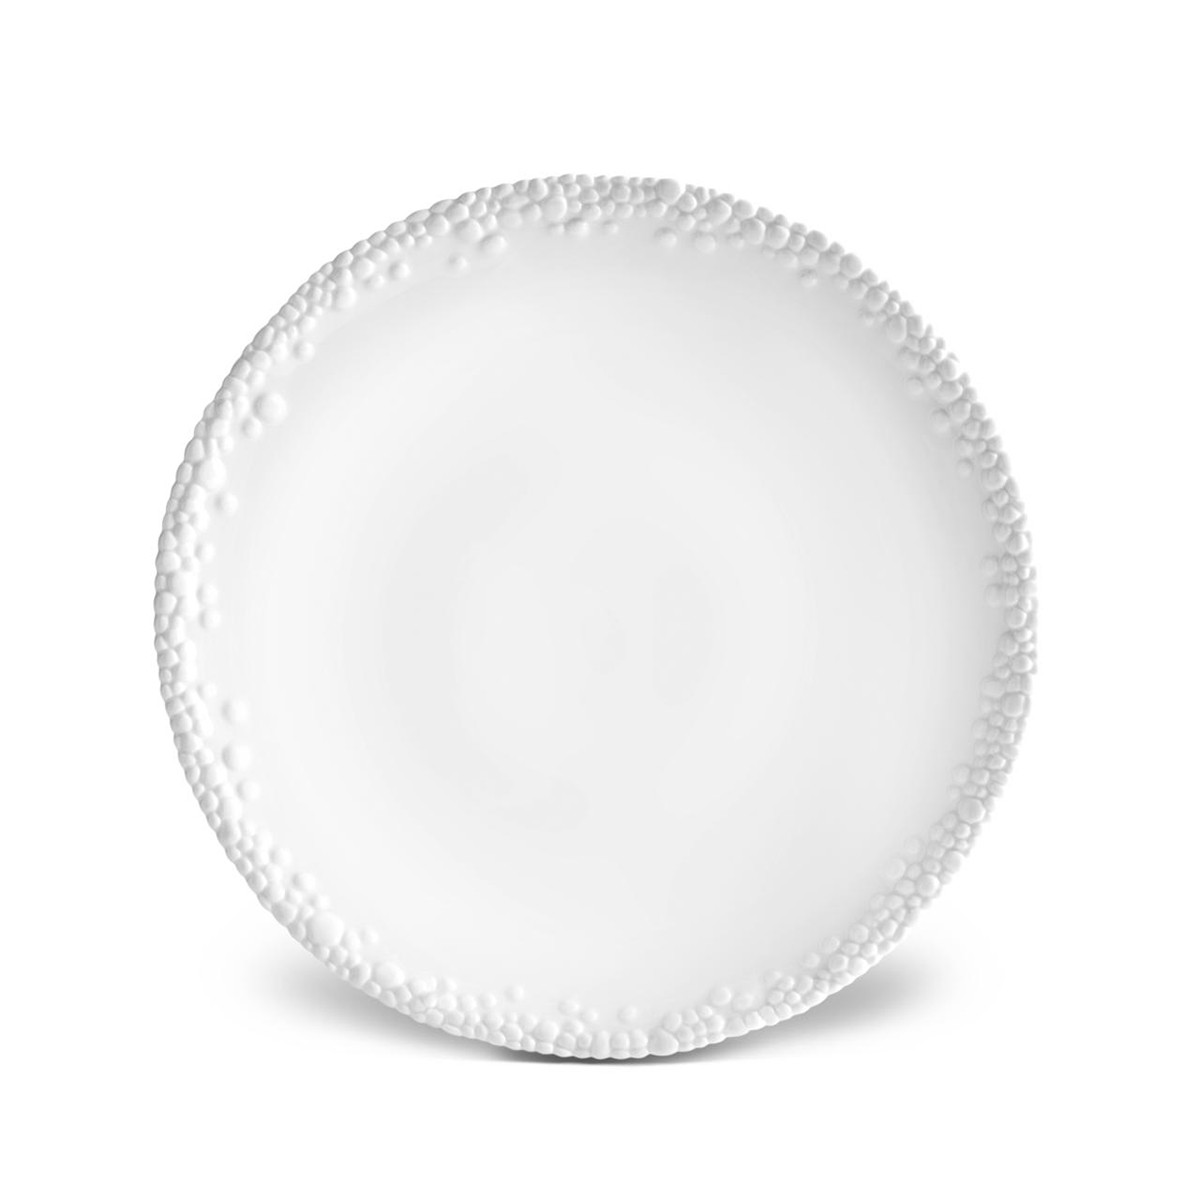 L'Objet I Haas Mojave Dinner Plate